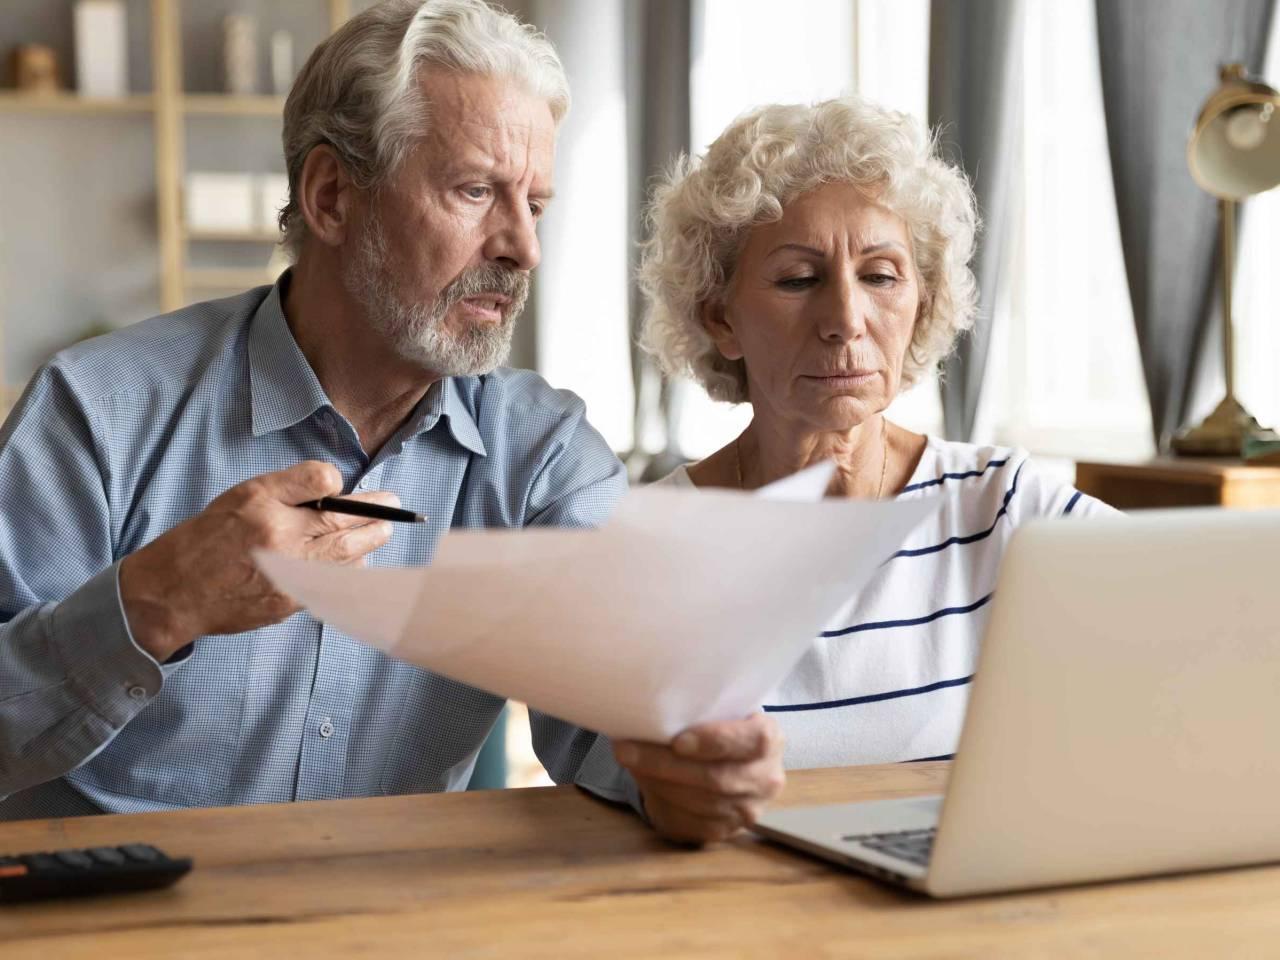 elderly couple worrying over finances